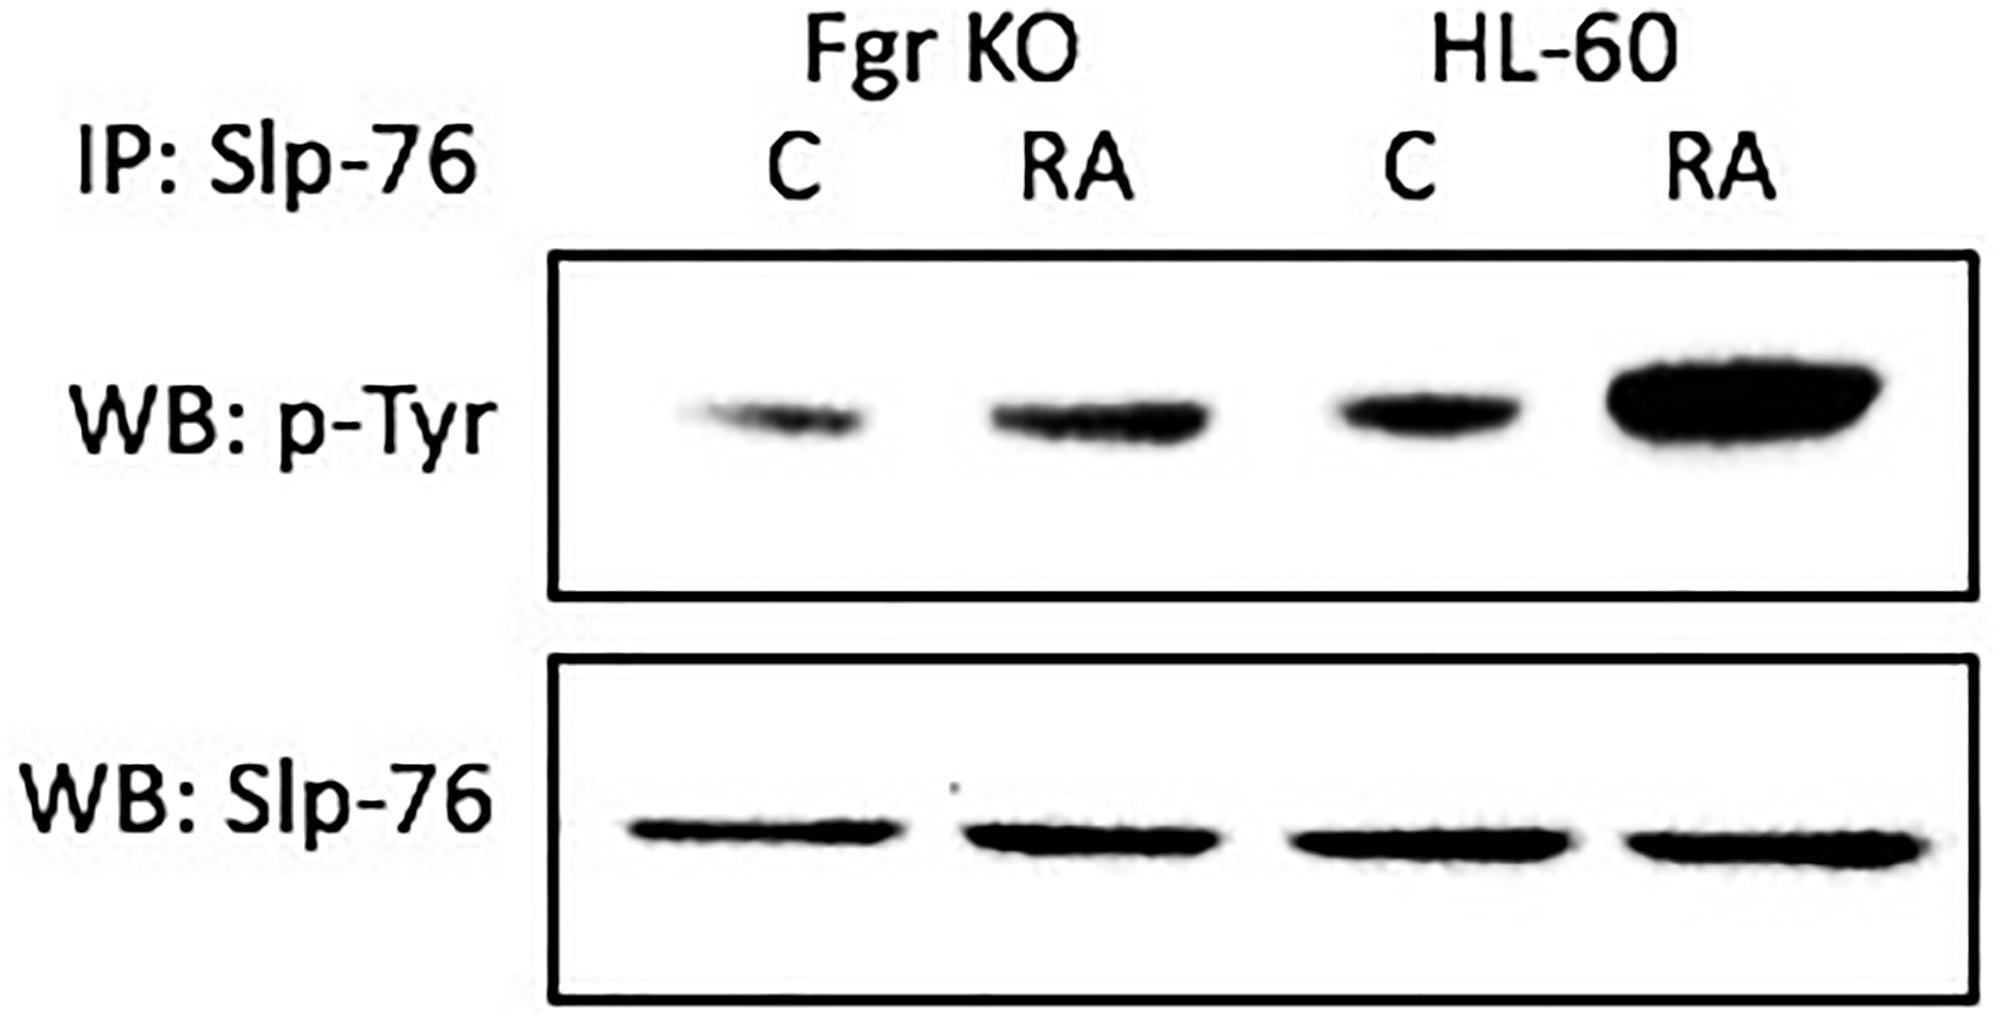 Slp-76 tyrosine phosphorylation in HL-60 wt and Fgr KO cells assessed by immunoprecipitation.